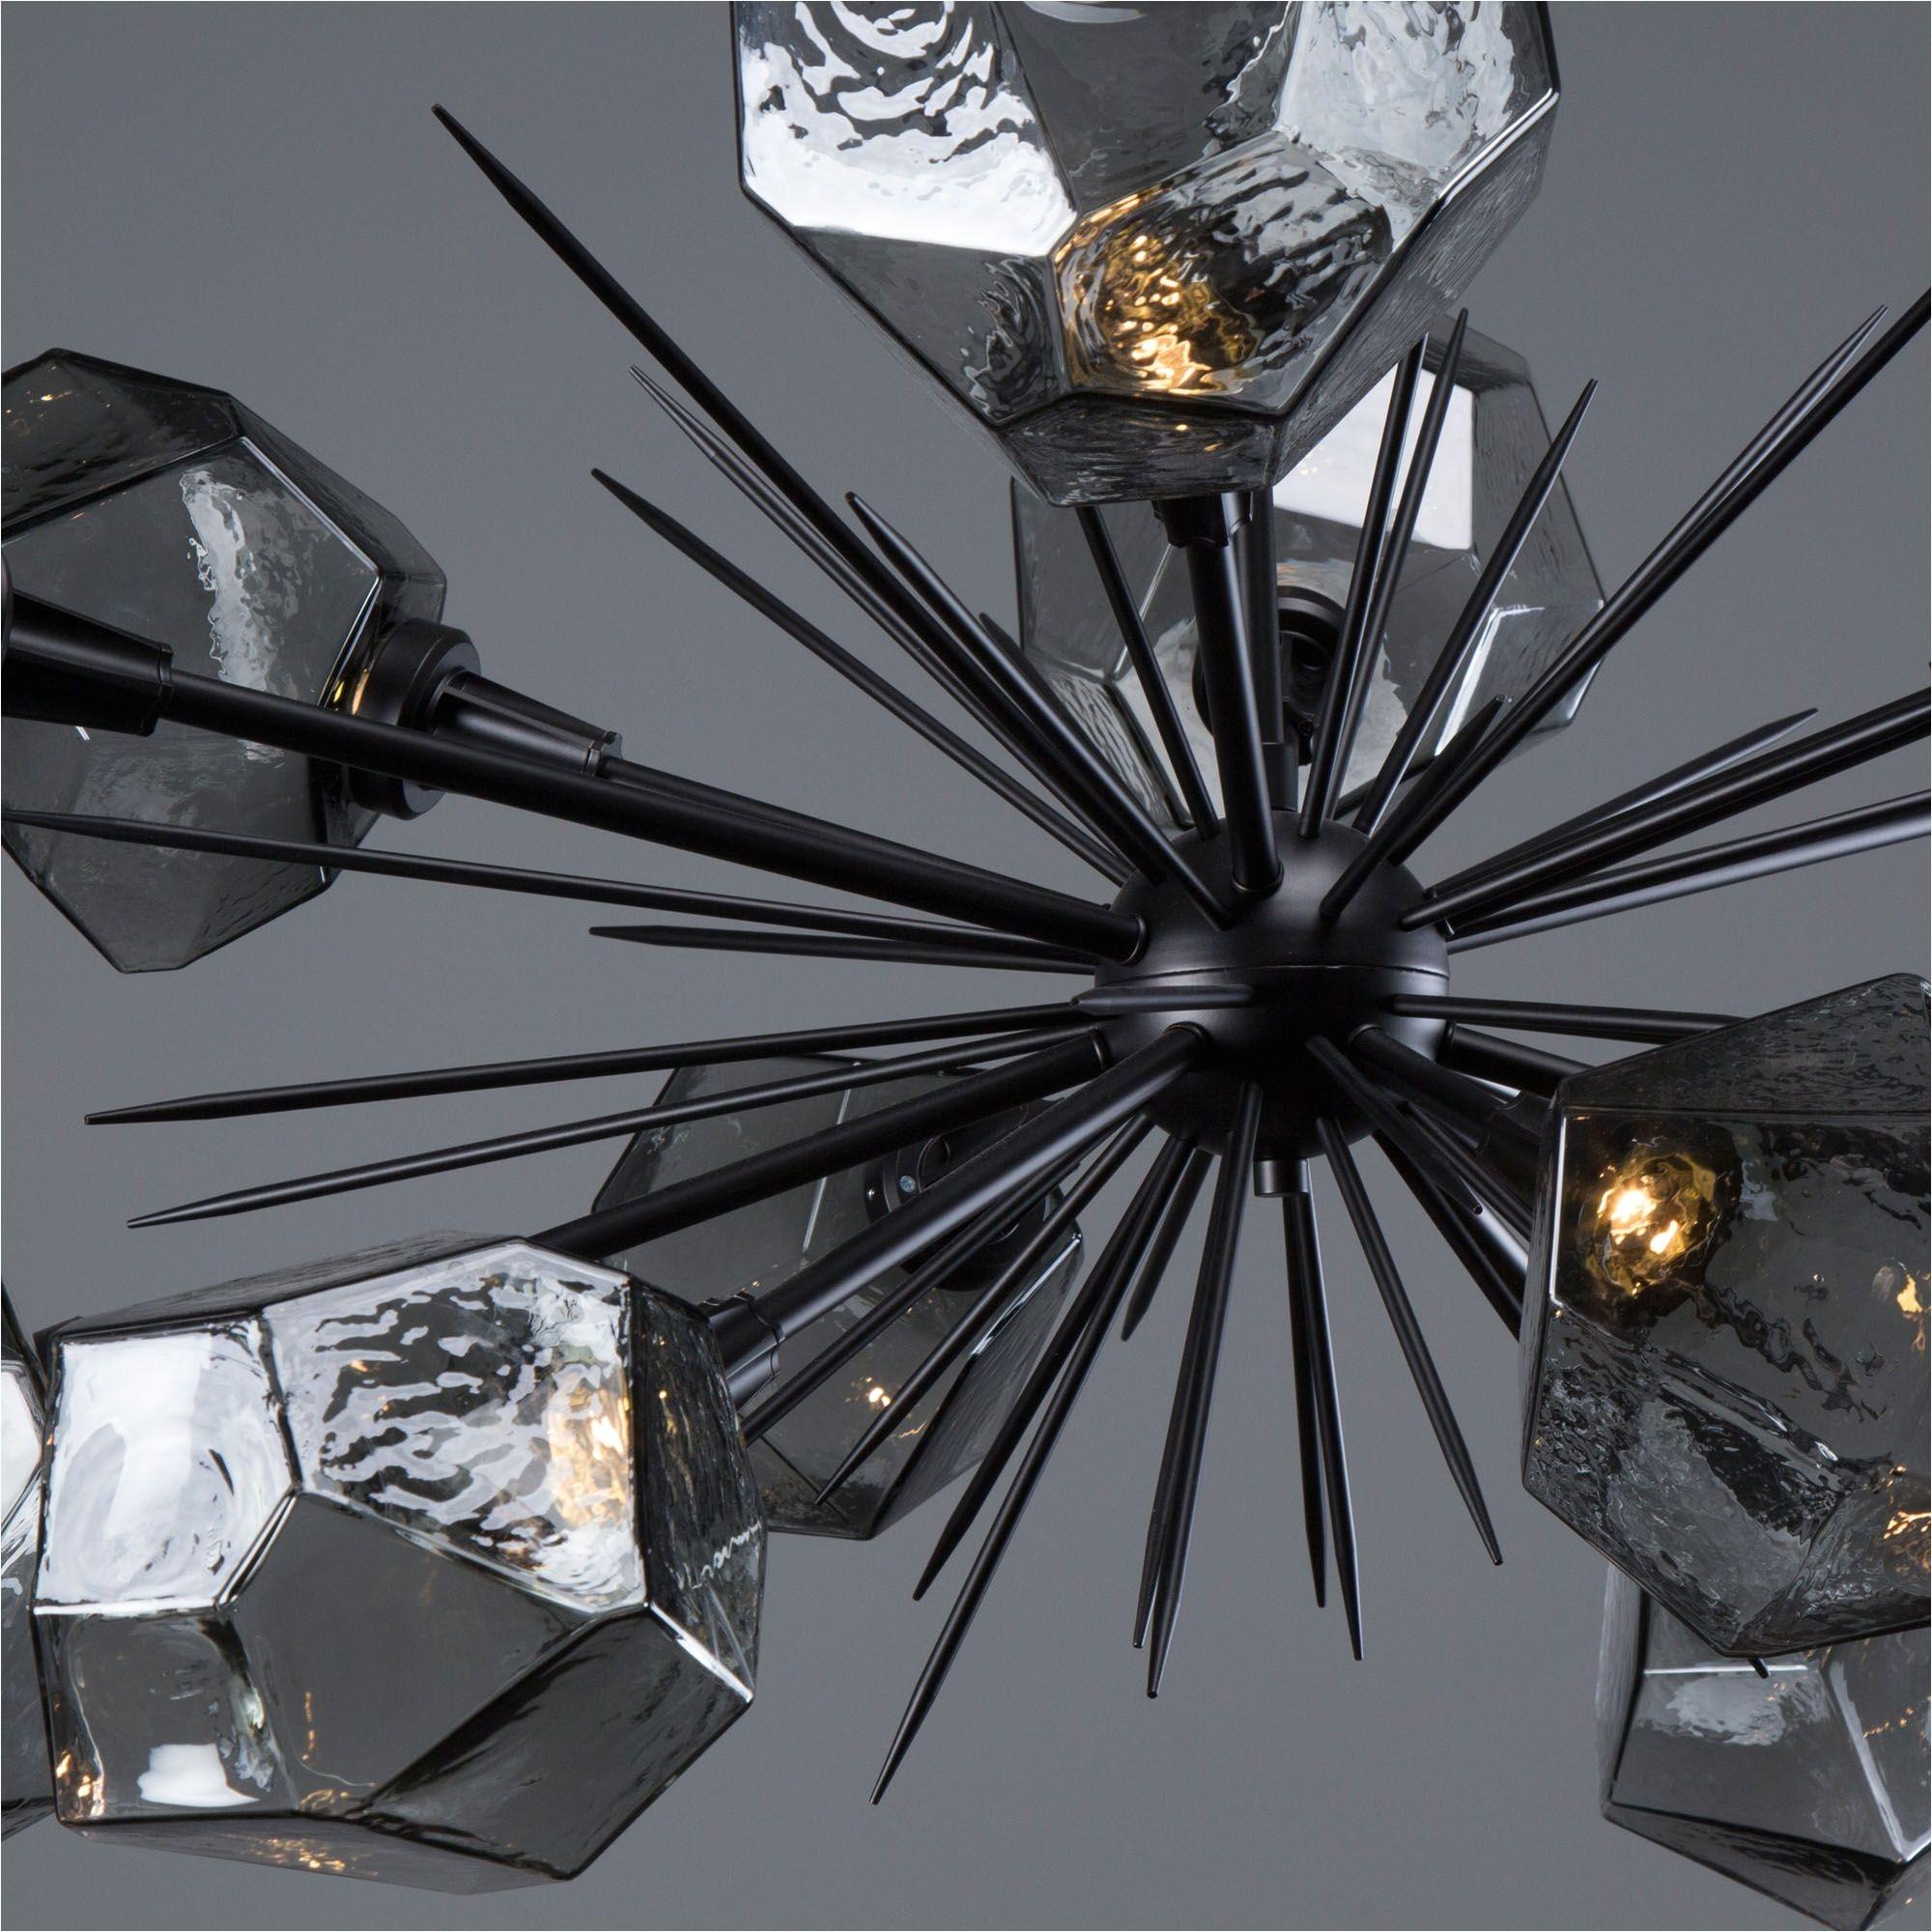 Dining Room Light Fixture Glass Inspirationa Gem Oval Starburst Chandelier Plb0039 0d